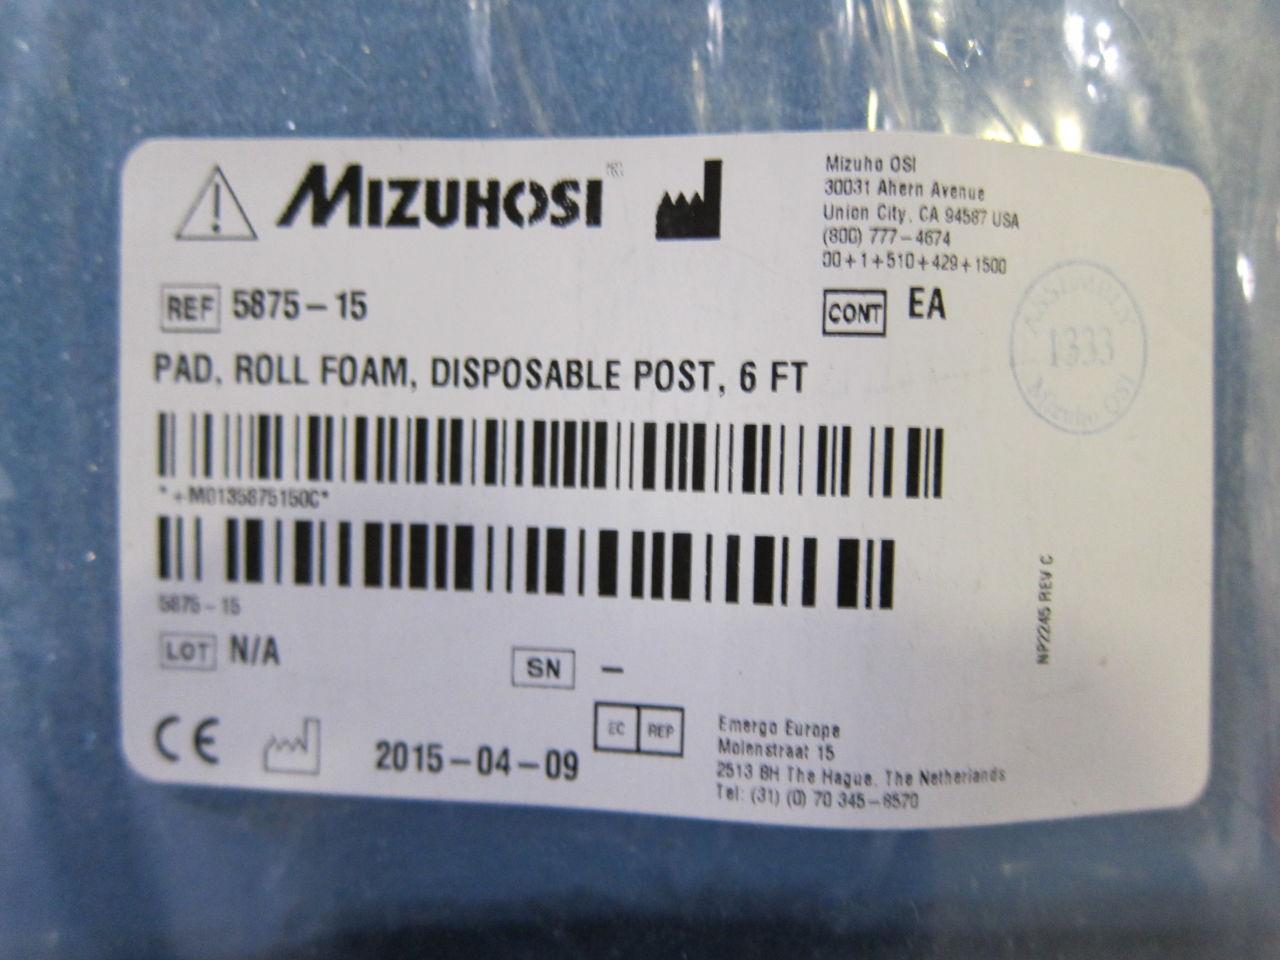 MIZUHO OSI 5875-15 6 Ft Pad